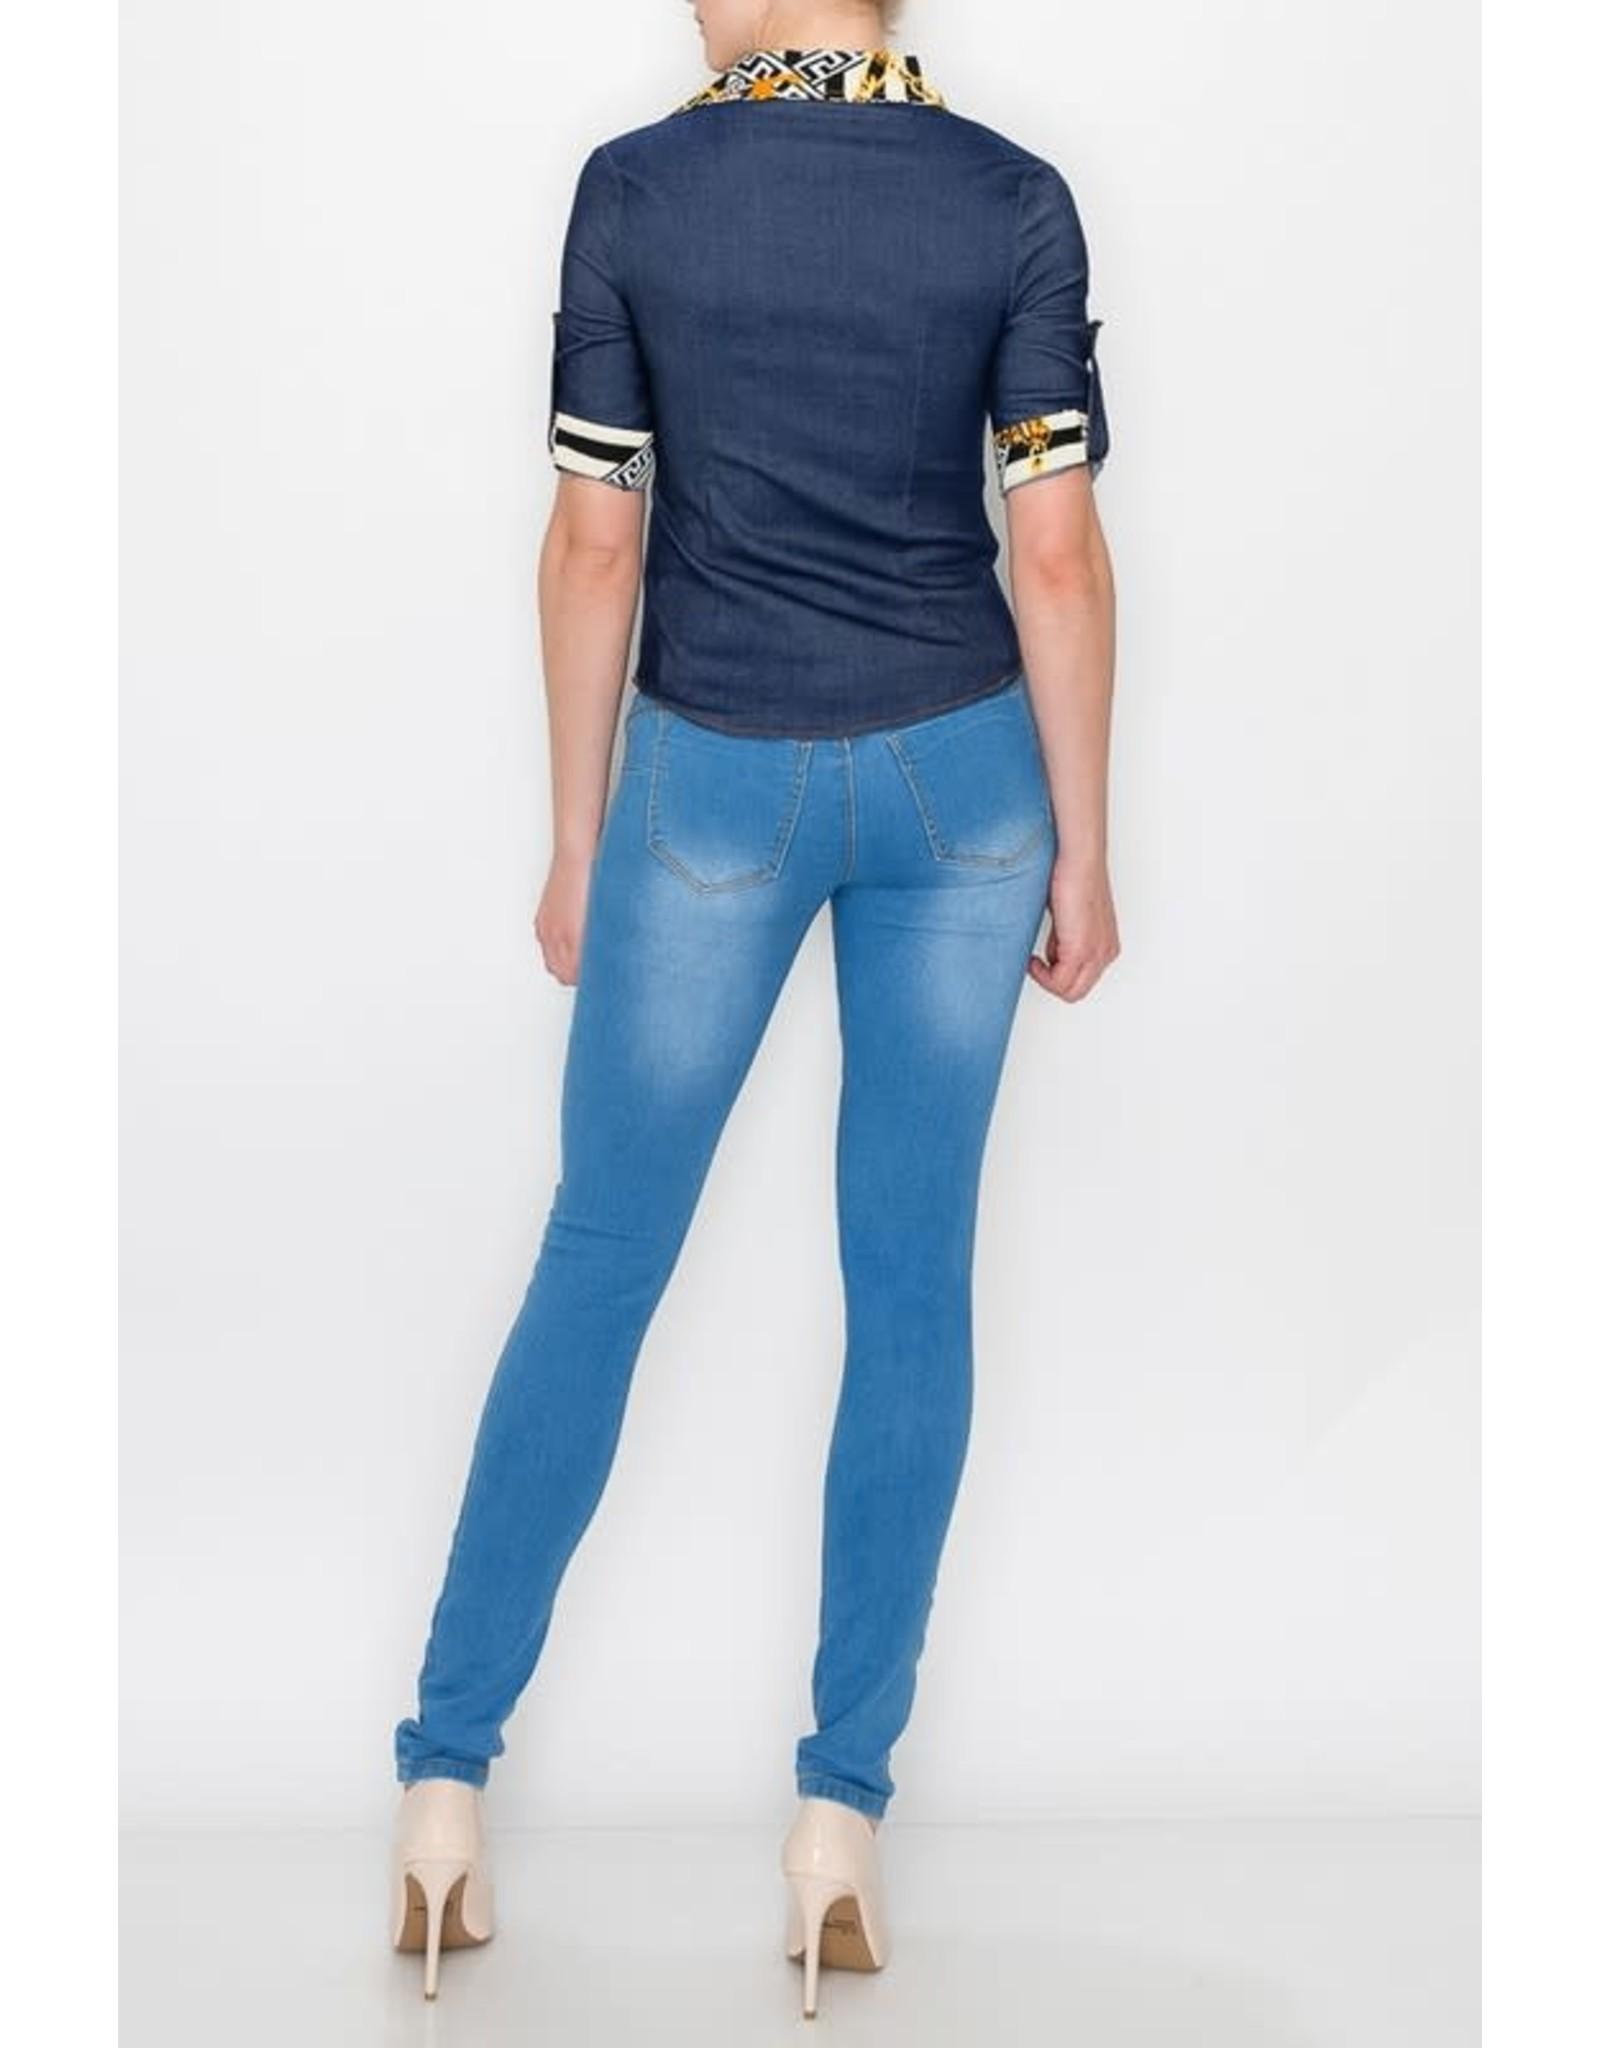 Stretch Denim Shirt with Zipper Collar Contrast